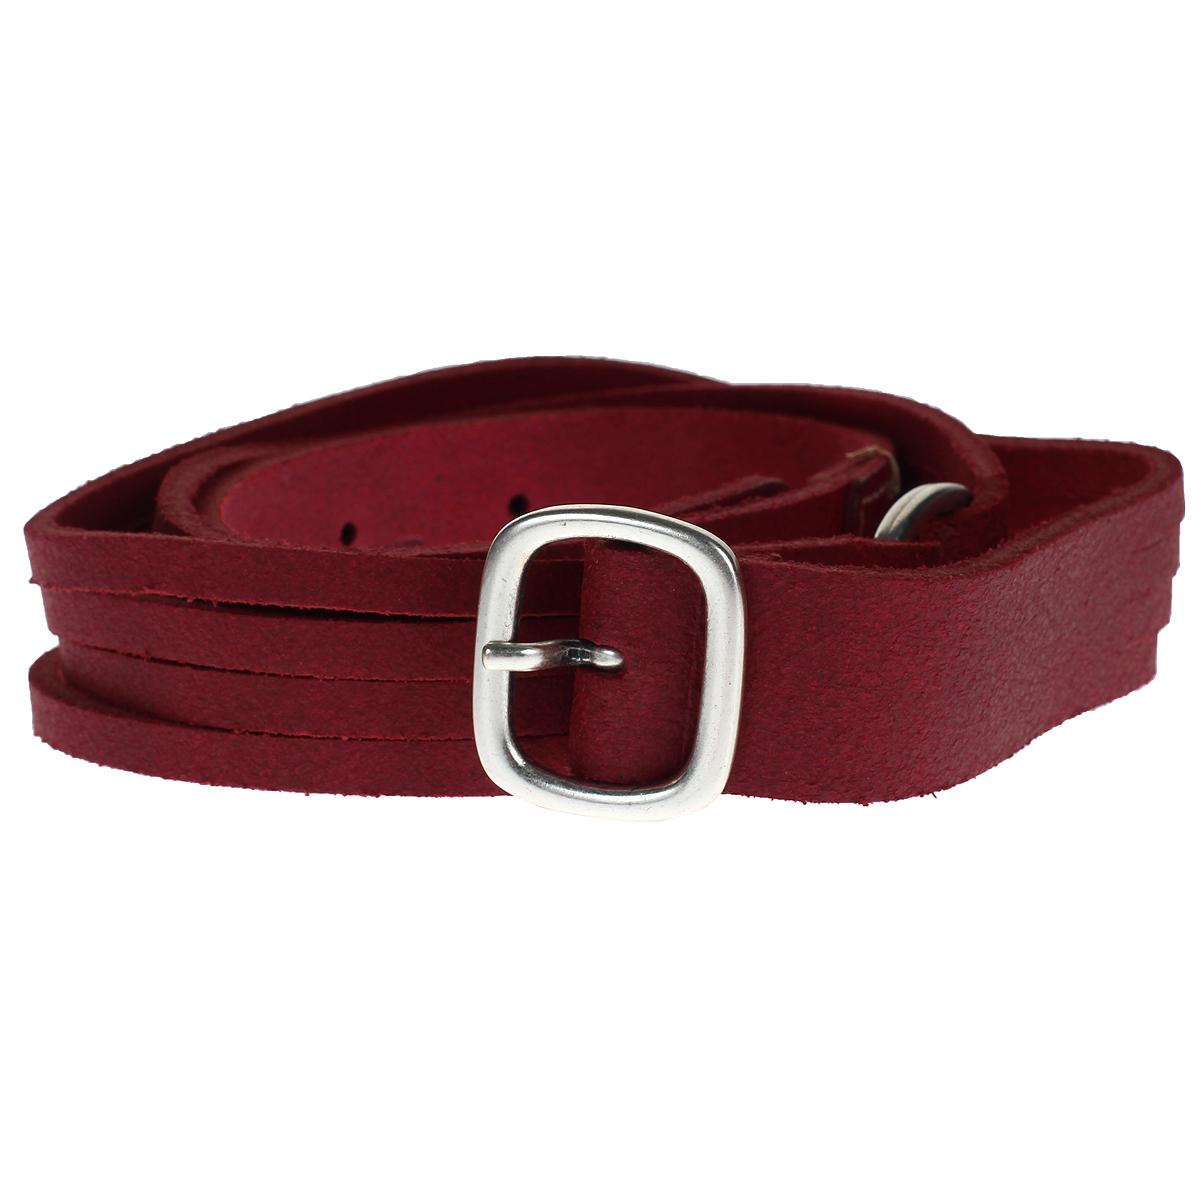 ������ ������� Cut Strap Belt - LeeLY065301�������� ������ �������� �� ����������� �������� ���� � ������������� �� ������������� ������. ������ ������� �� ���� ������, ����������� ������������� ������� � �������������� ��������� ���������. ������ - ����� ������ ����� ��������� � � ��� ������ ����� ���������� ����� ��������. ����� ������ �������� ��� �����, ����� � ������.